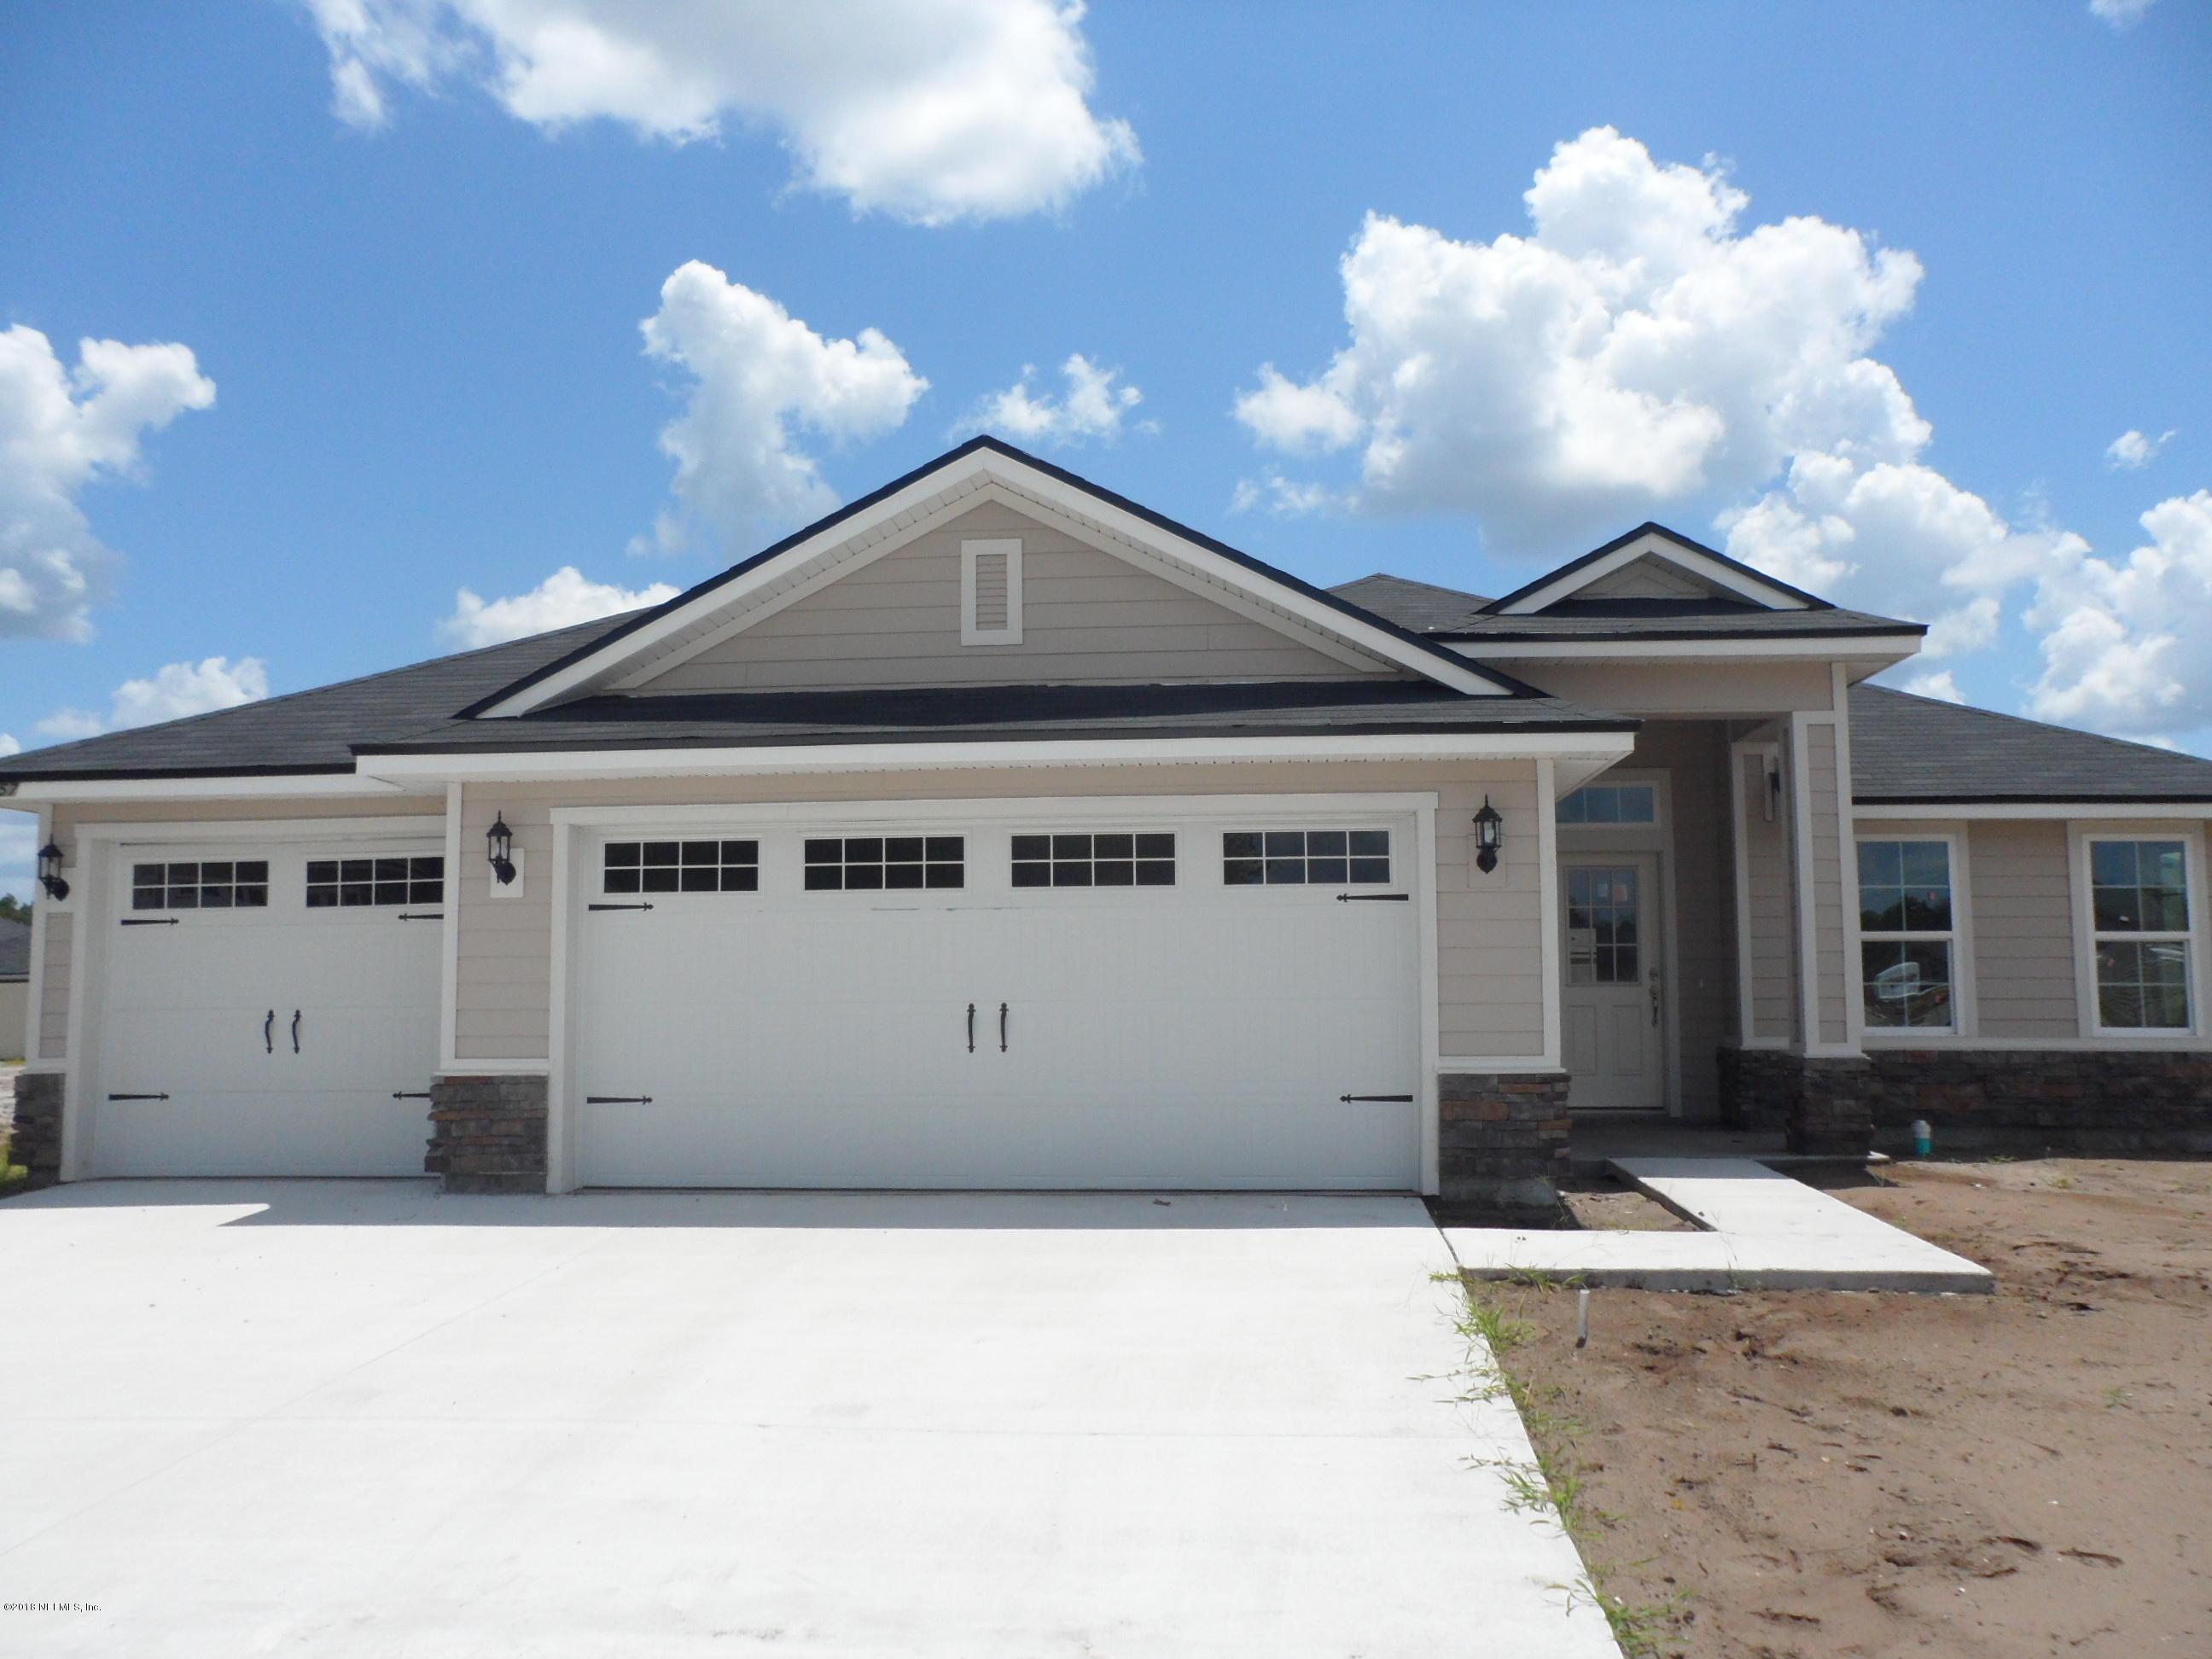 96357 GRANITE, YULEE, FLORIDA 32097, 4 Bedrooms Bedrooms, ,3 BathroomsBathrooms,Residential - single family,For sale,GRANITE,924059